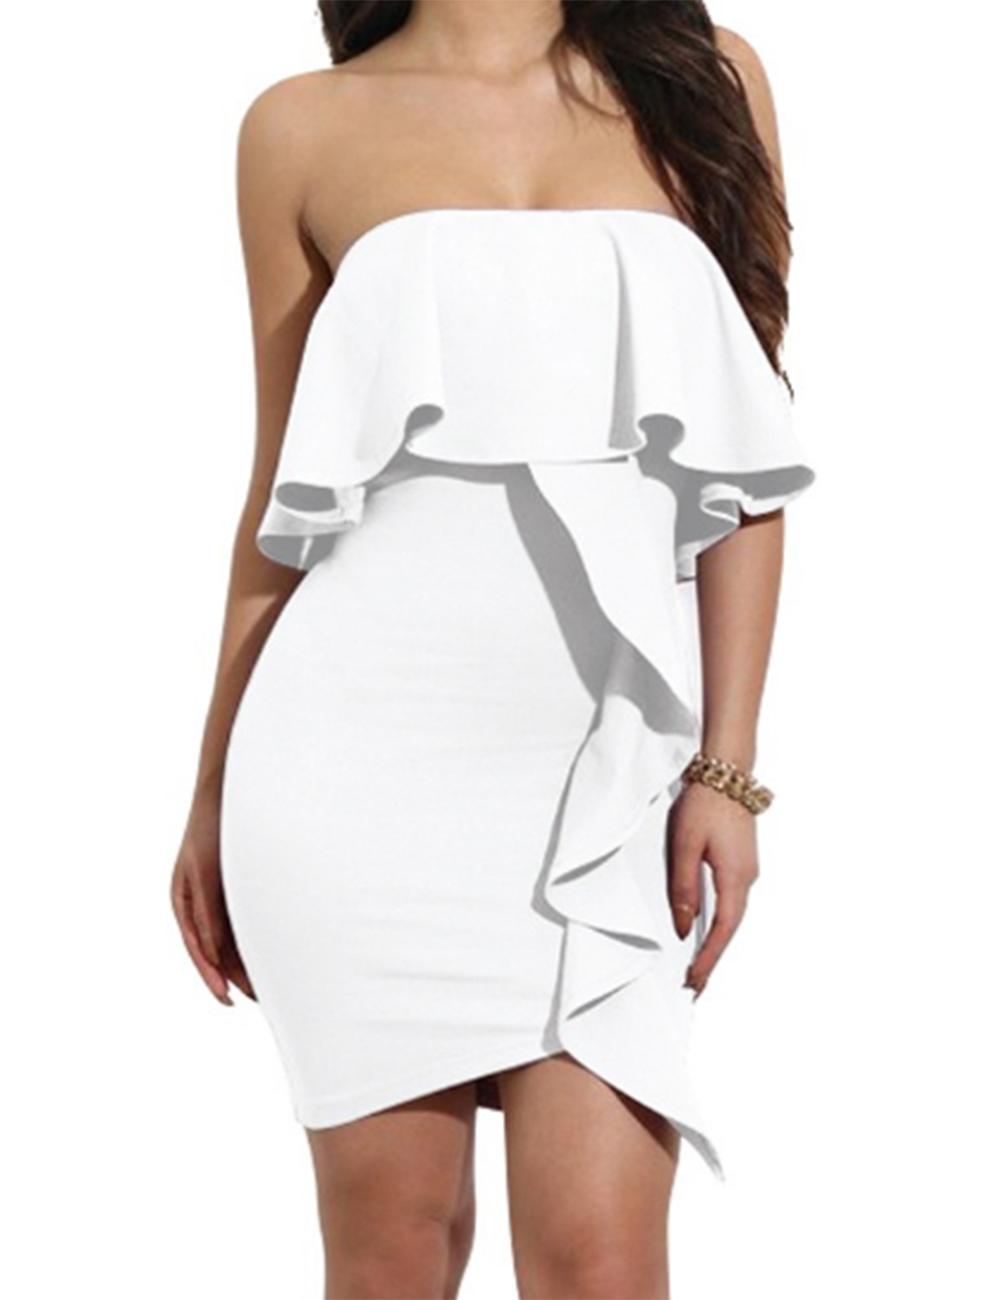 Women Sexy Off Shoulder Sleeveless Slim Dress One-piece Skirt